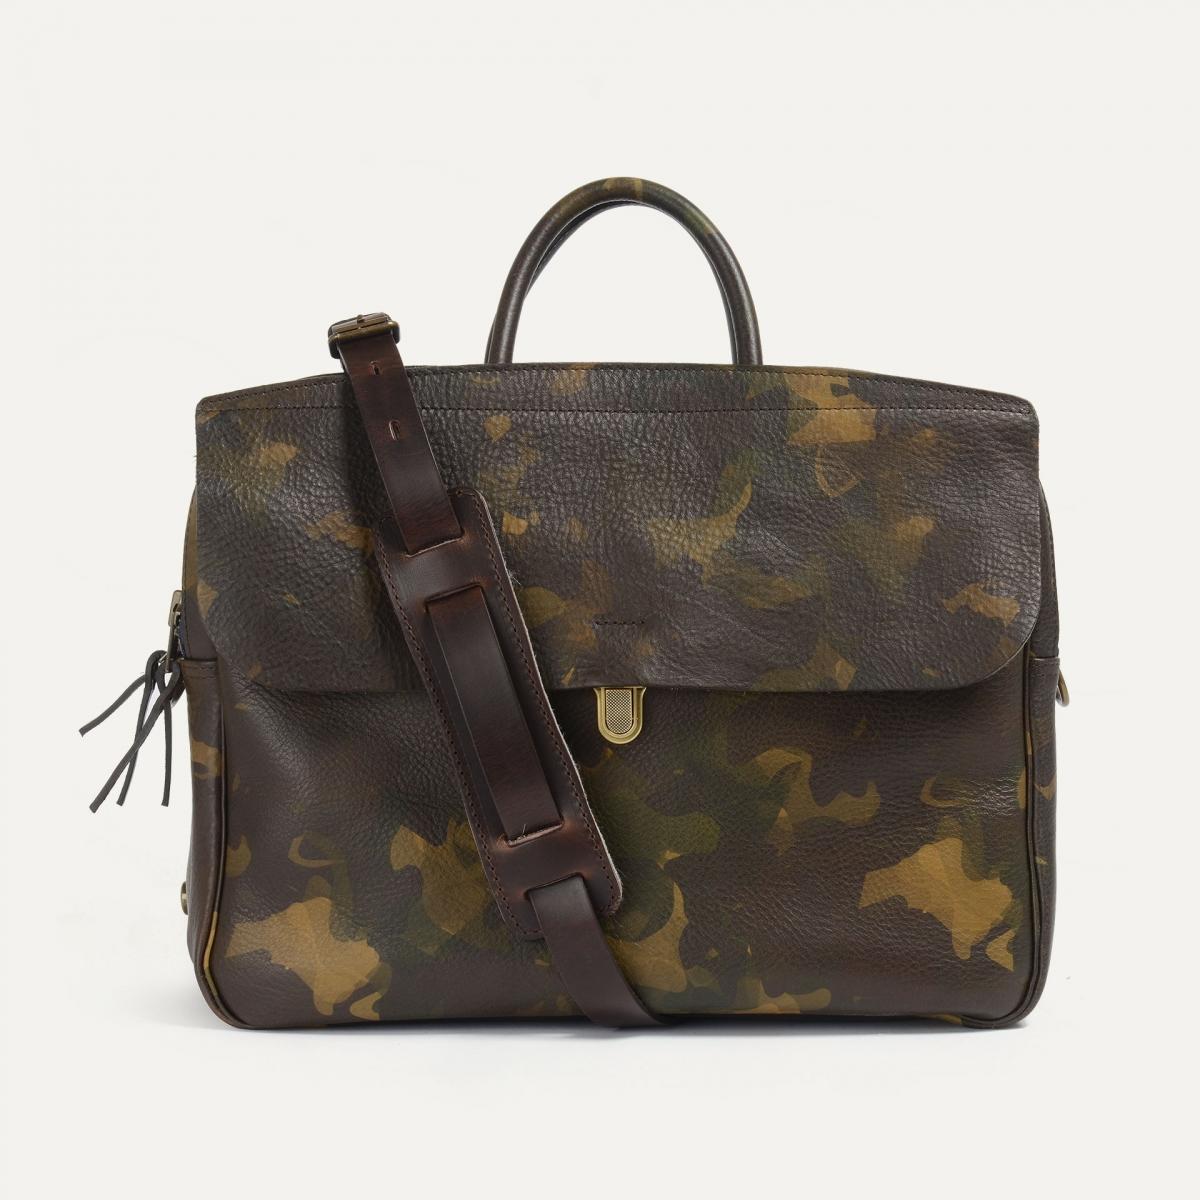 Zeppo Business bag - Camo (image n°1)